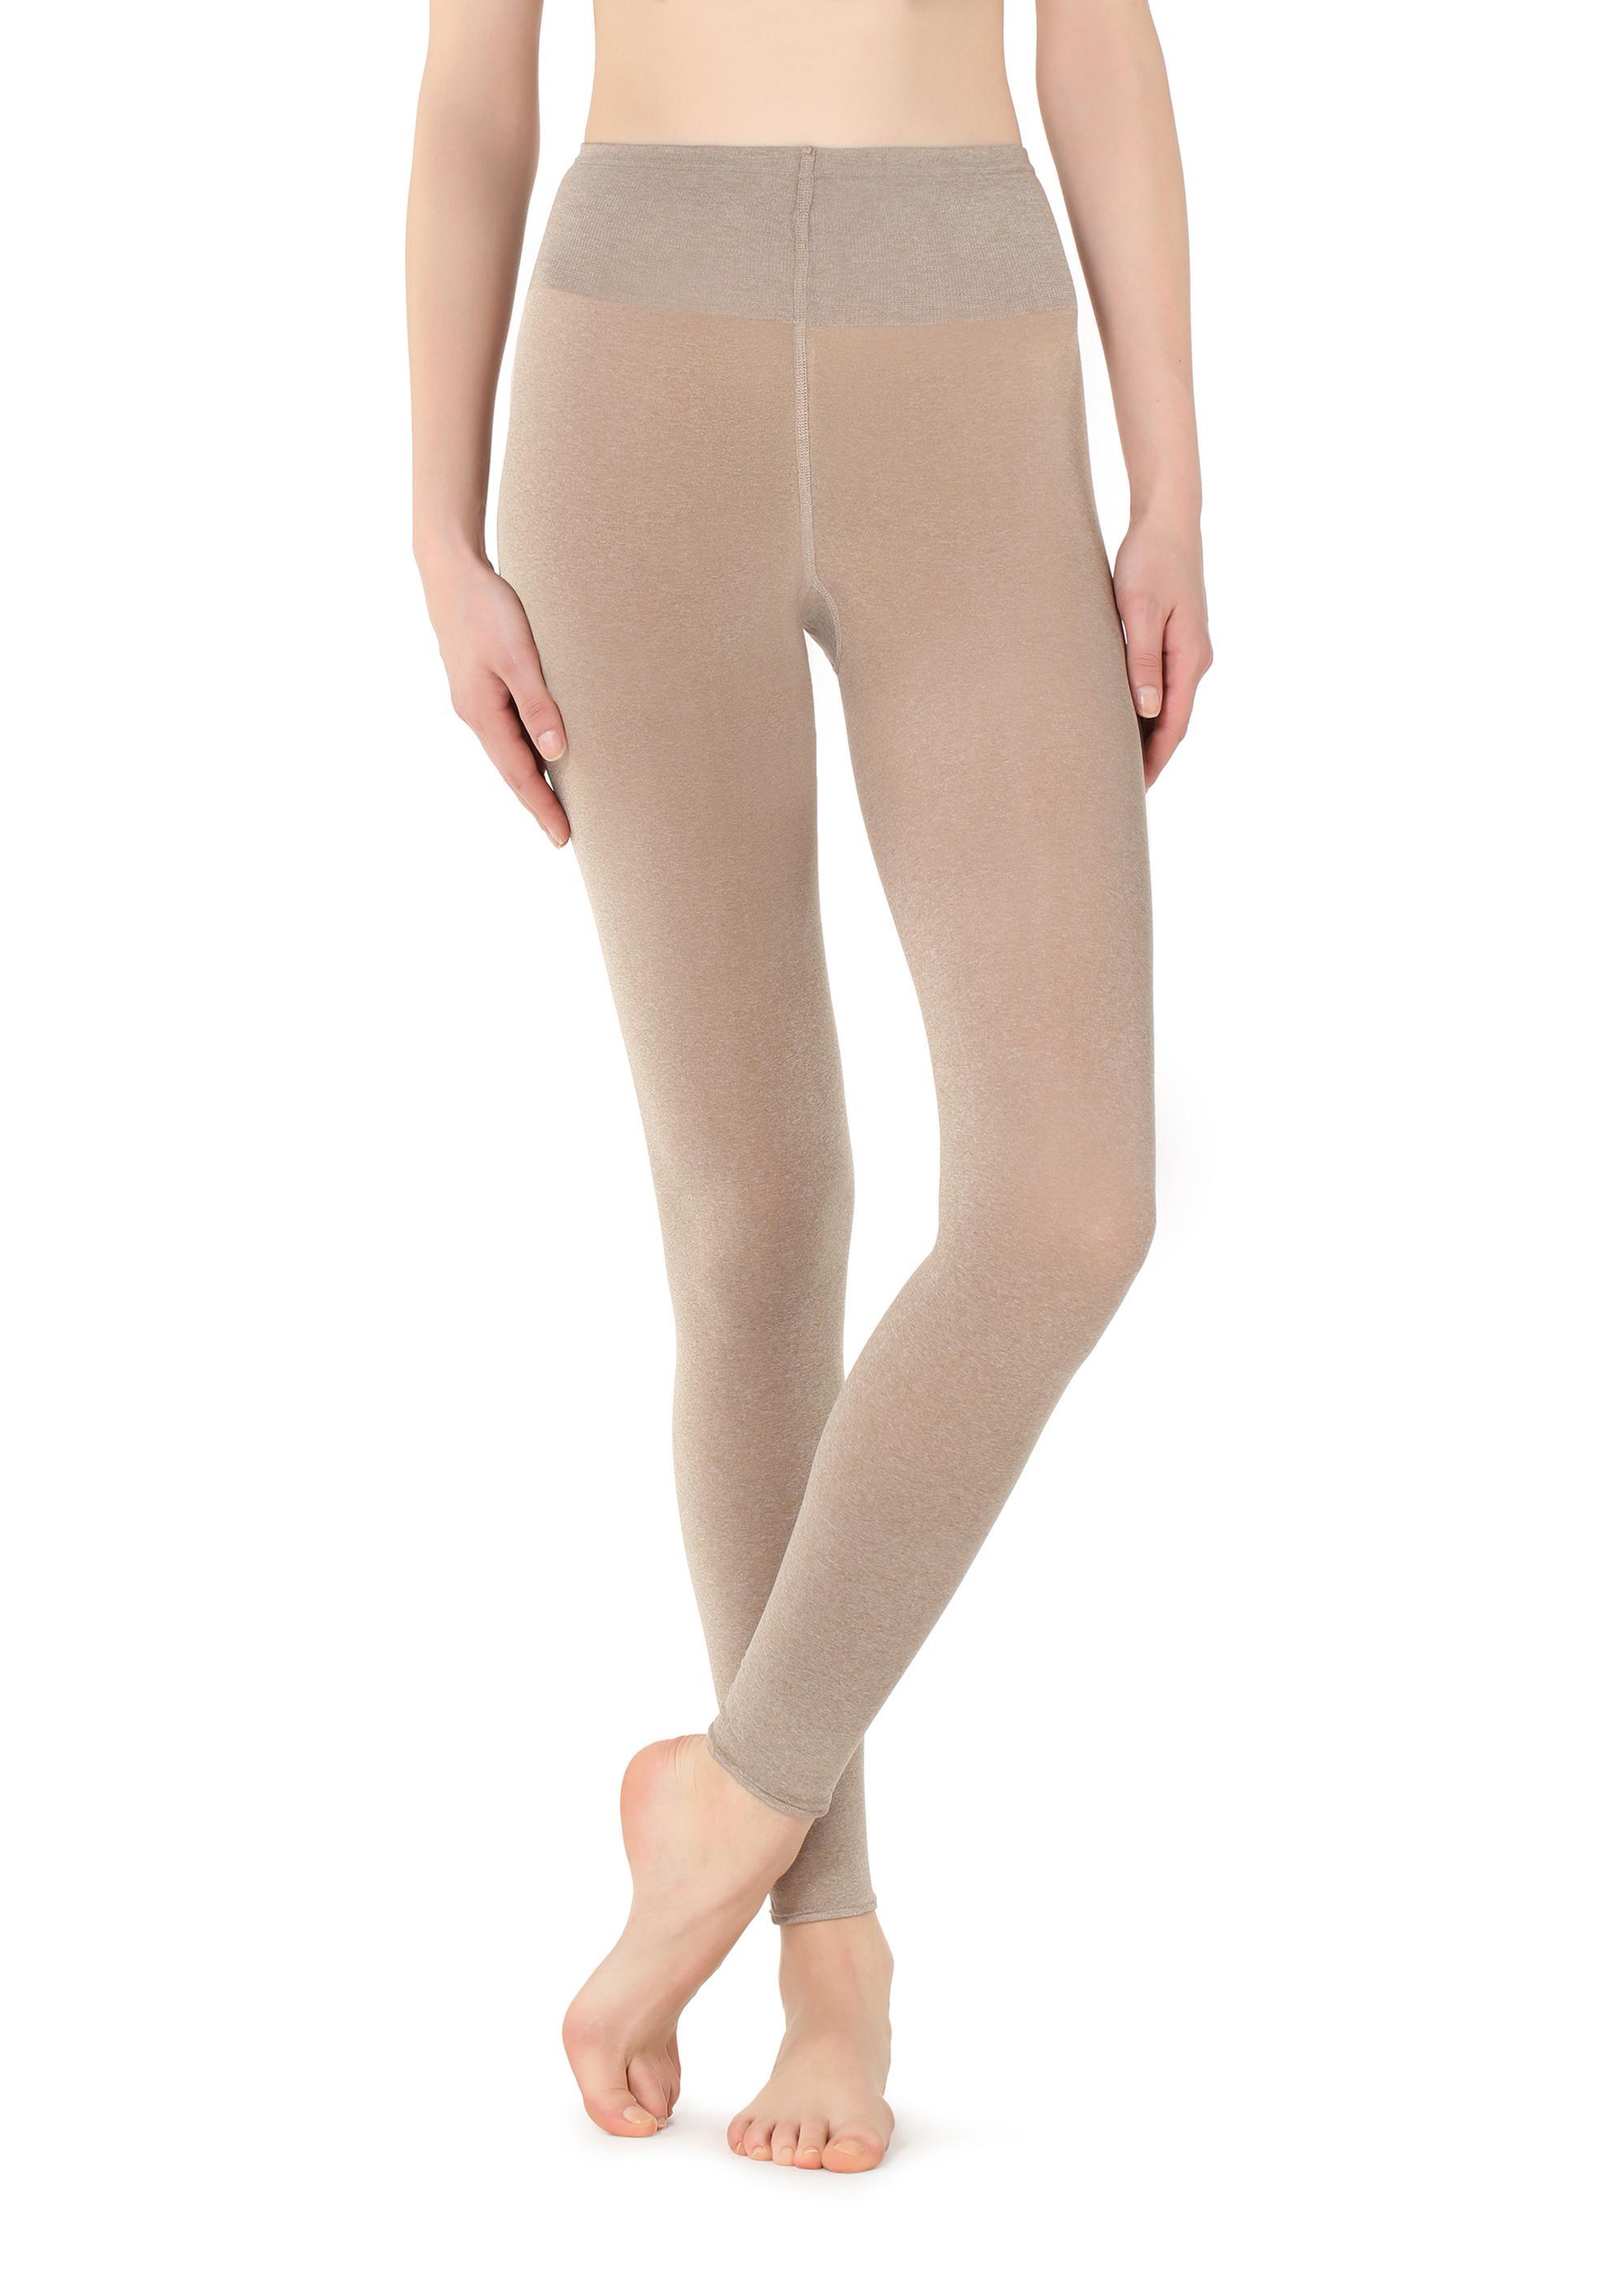 9db883774 Opaque 50 Denier Soft Touch Leggings - Calzedonia